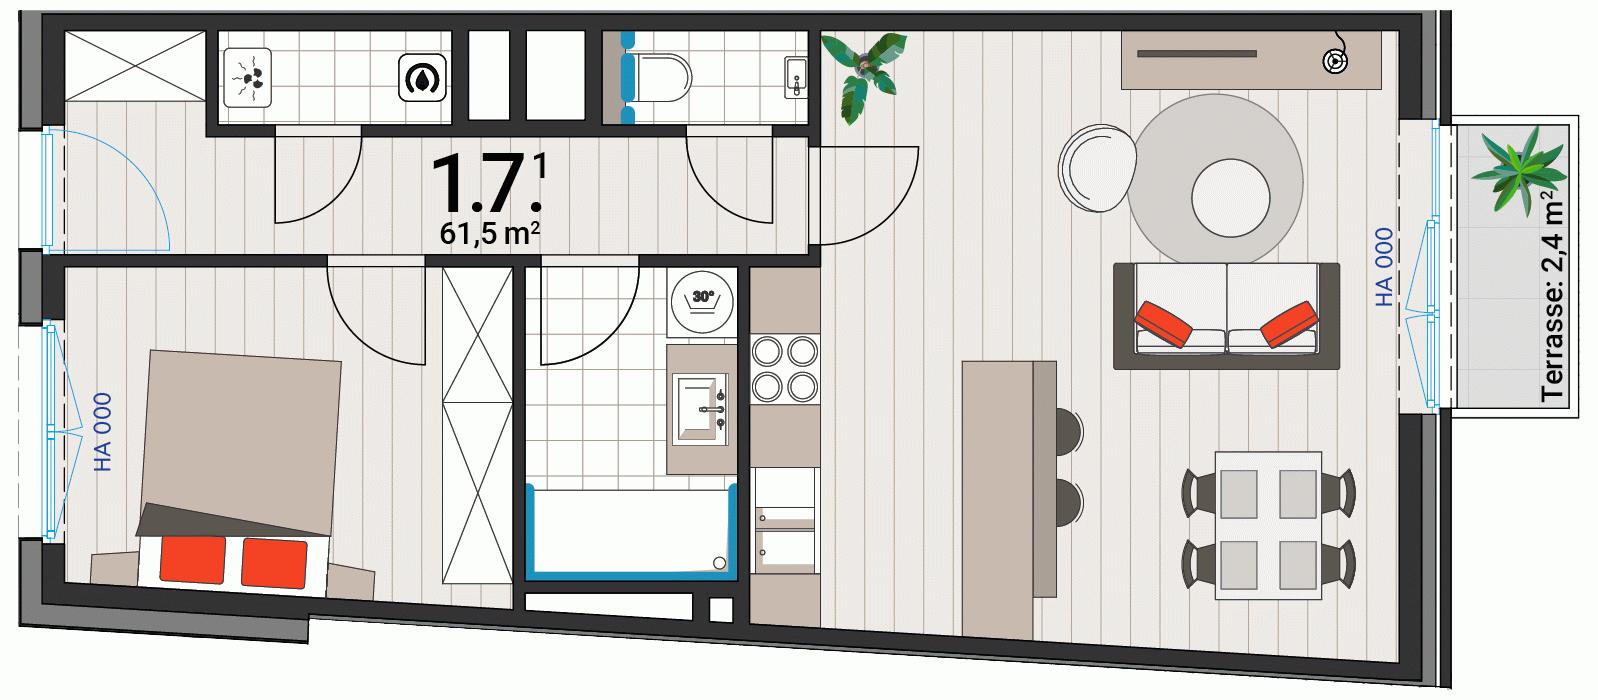 Appartement 1.7.